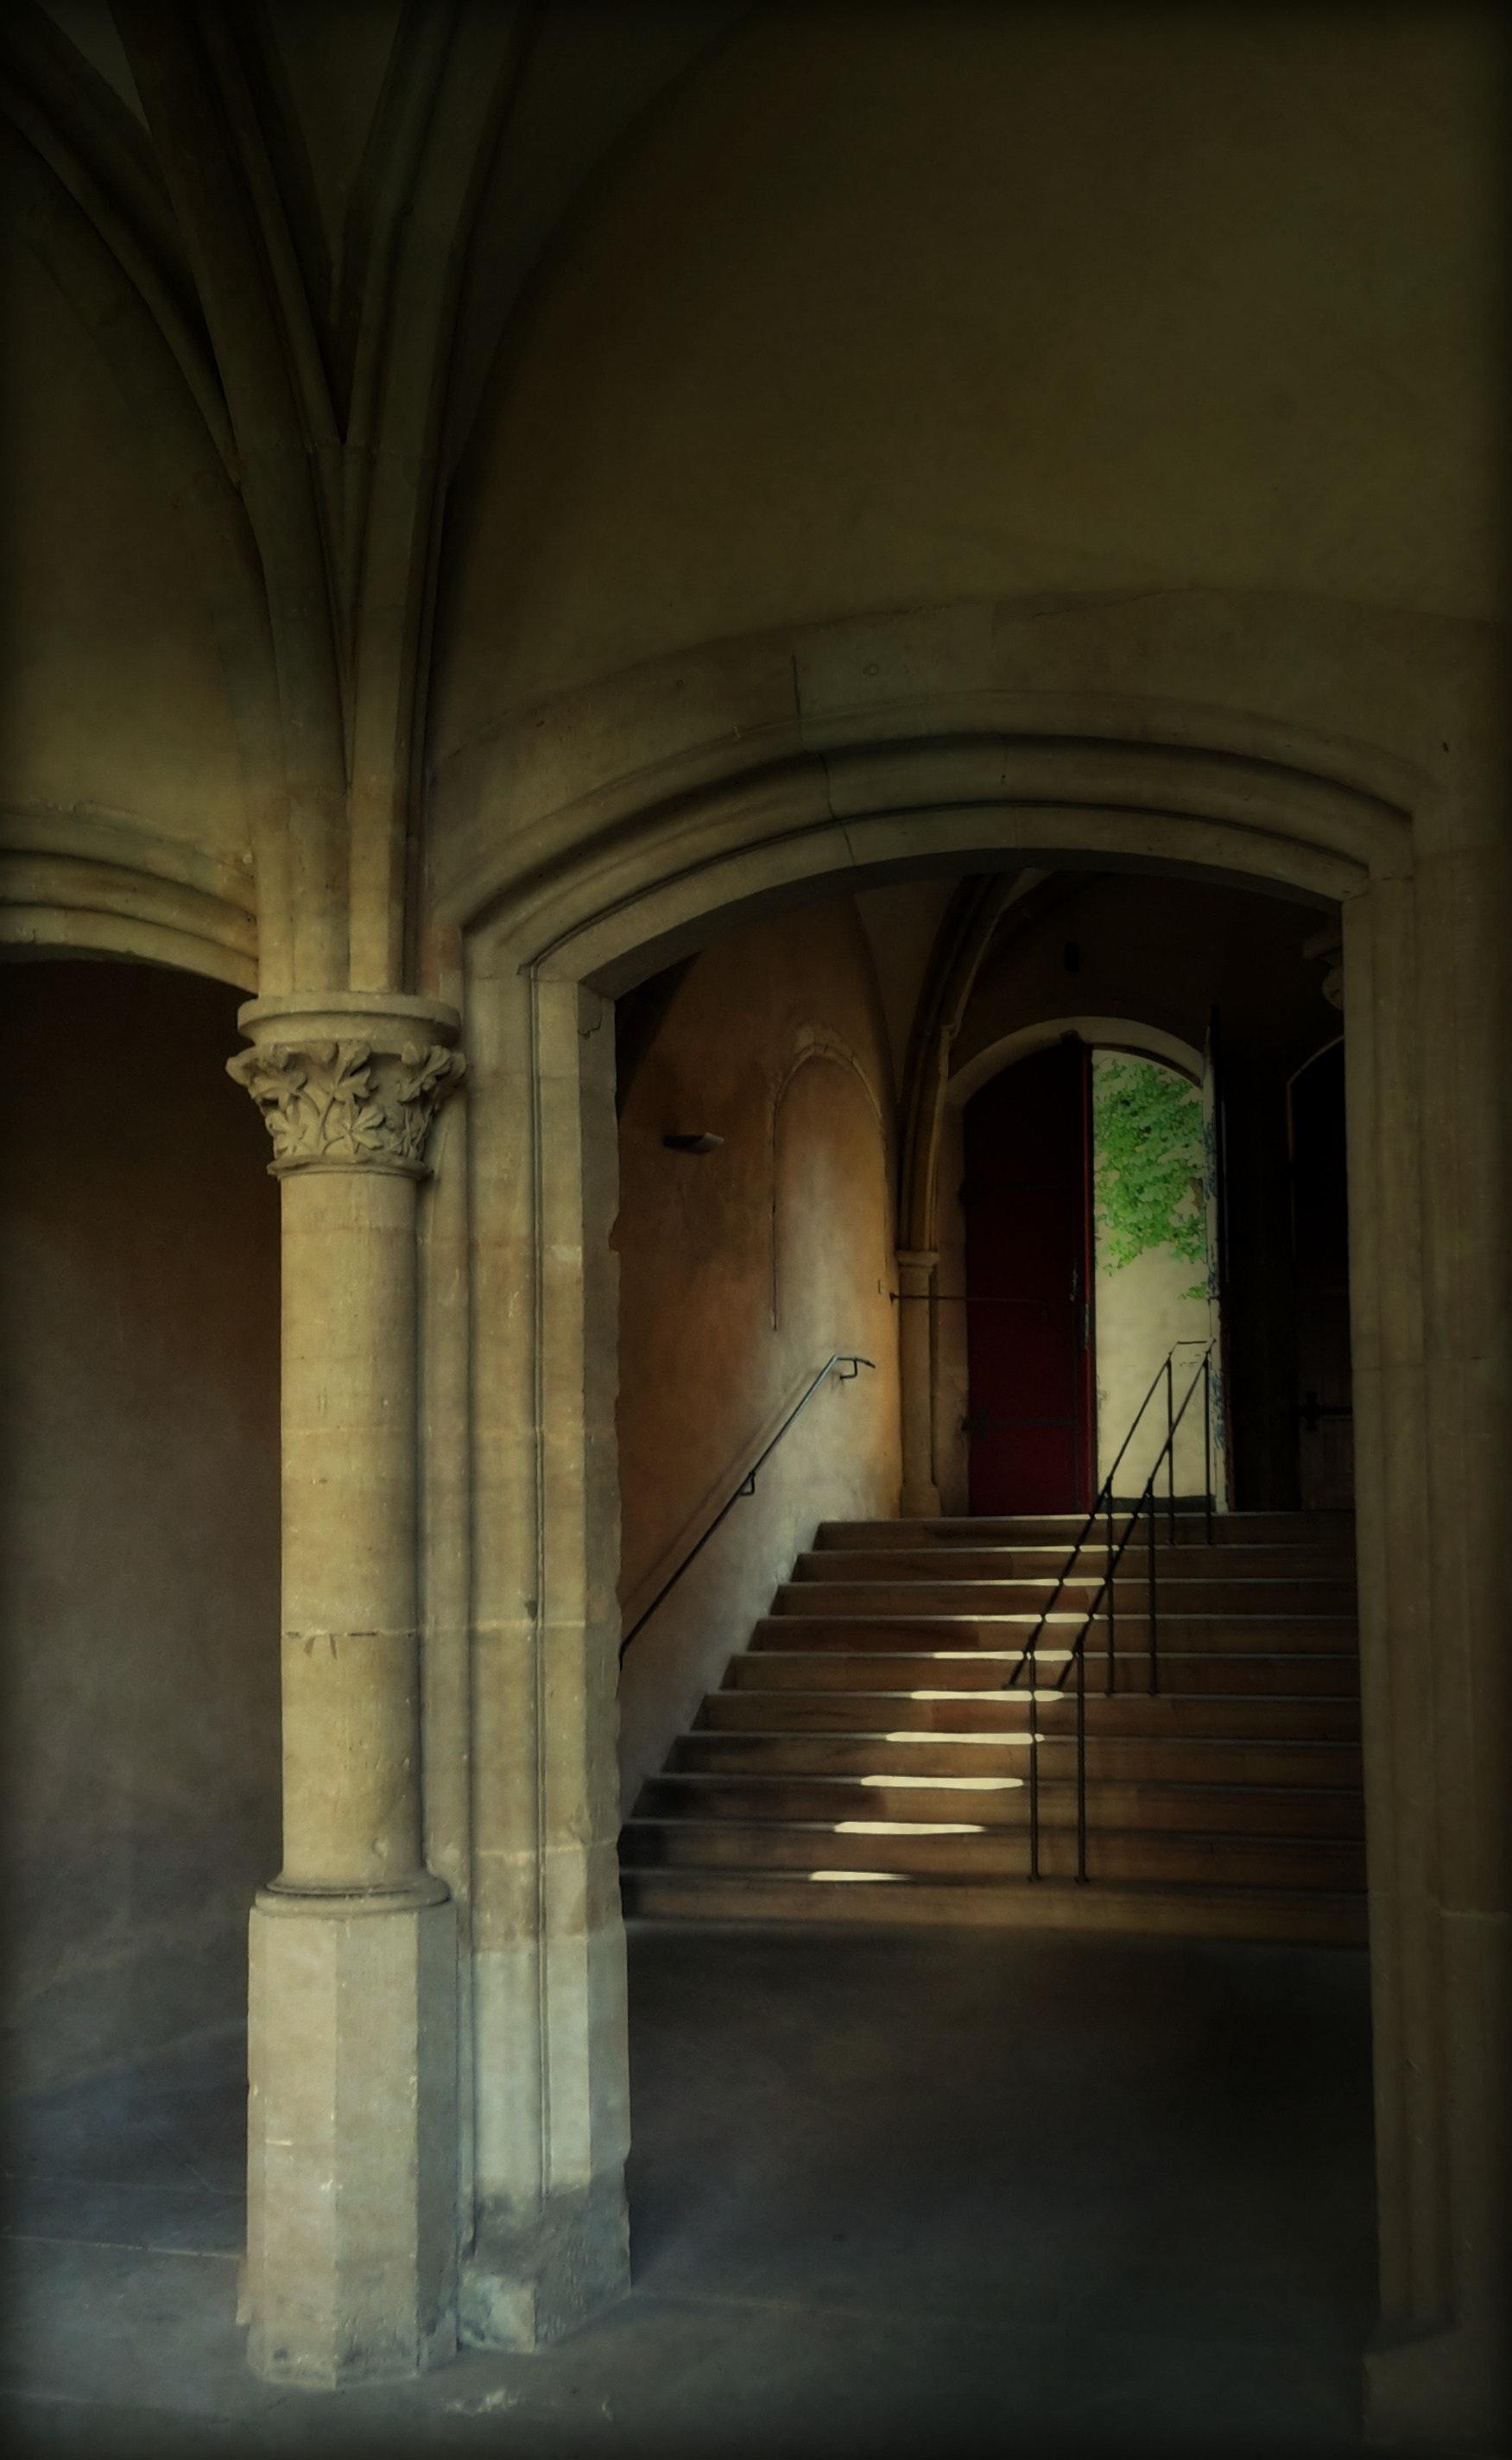 Beige stone stairway by brown door photo